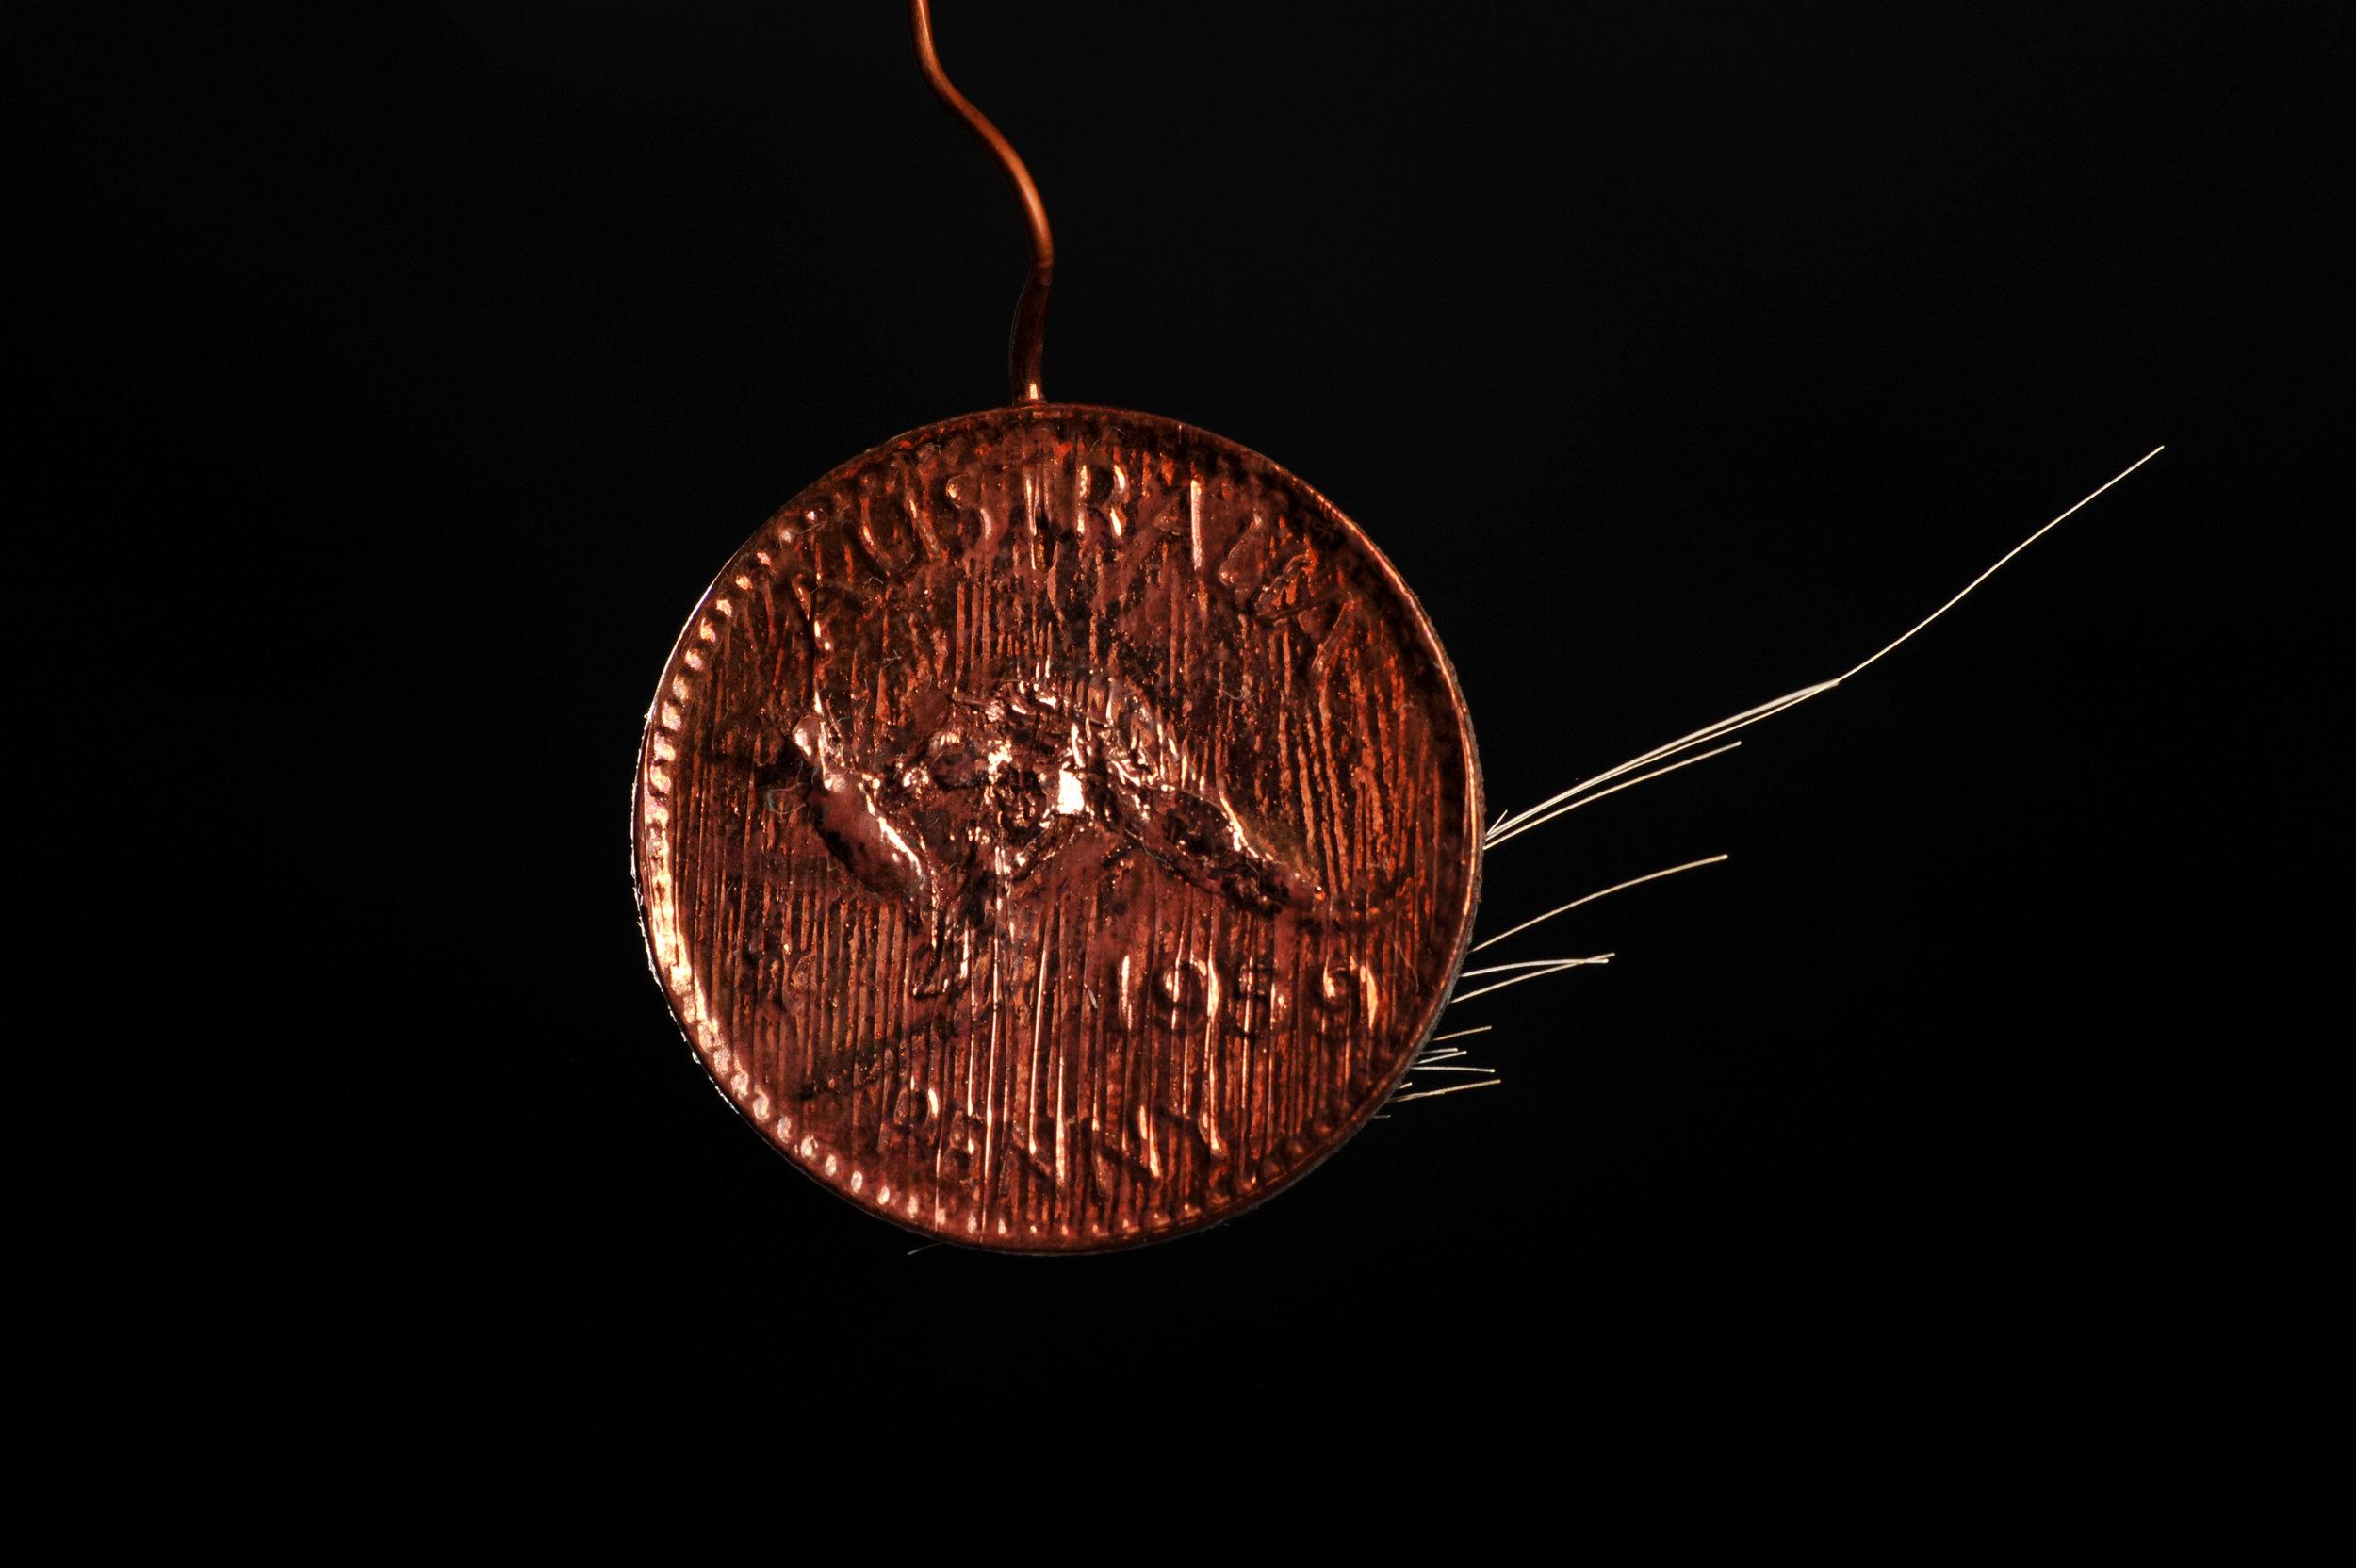 Copper penny 2